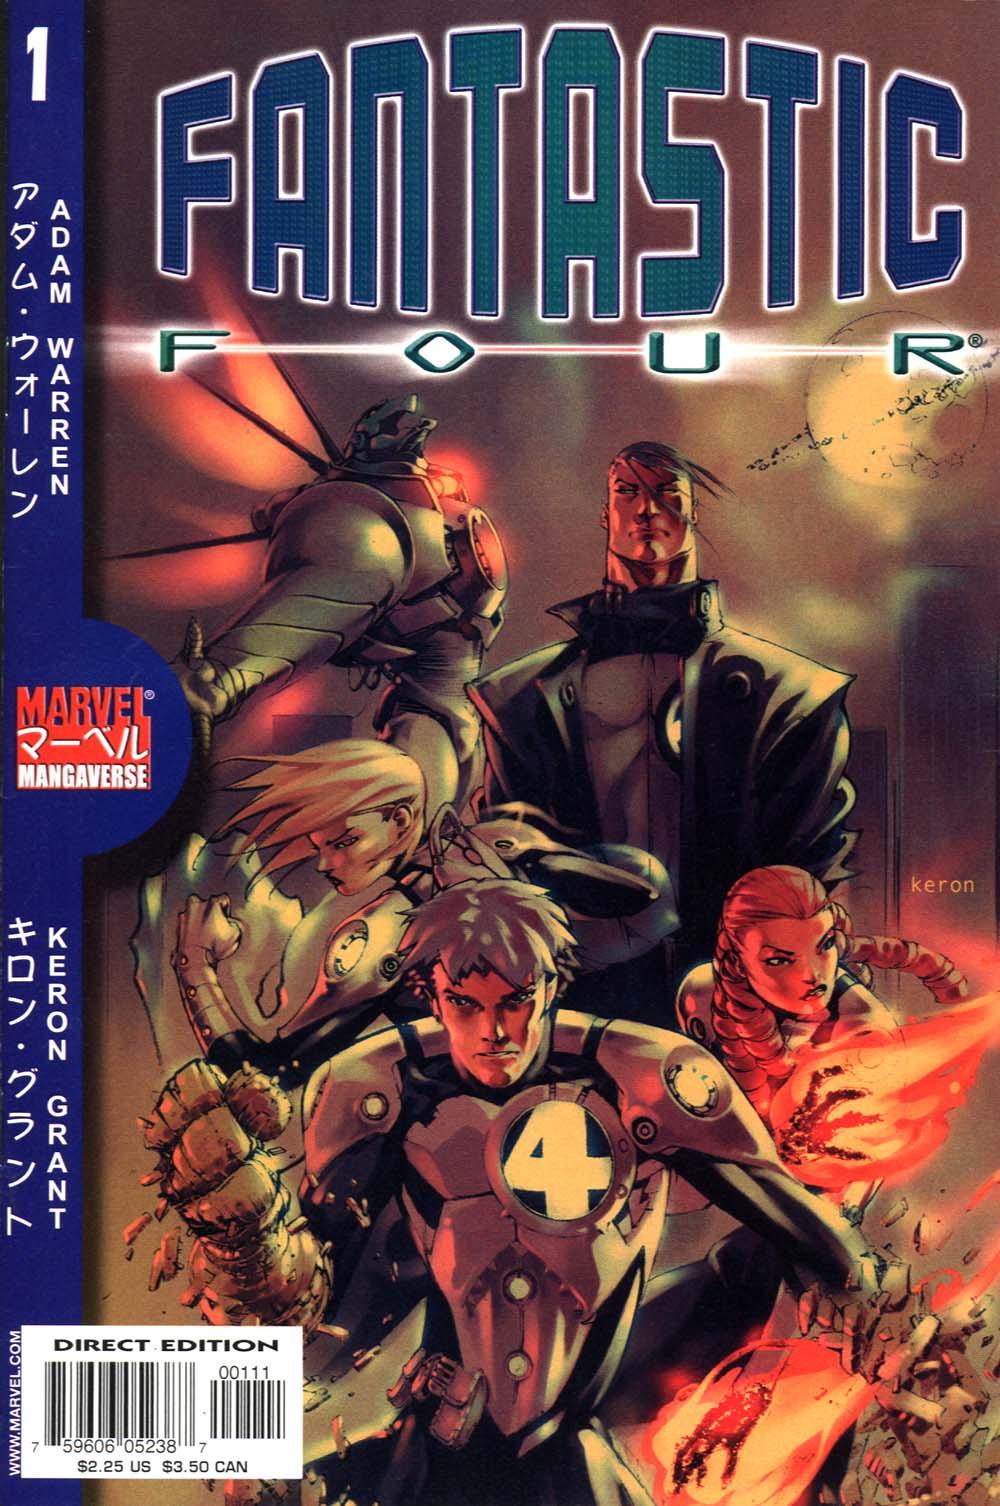 Marvel Mangaverse: Fantastic Four Full Page 1